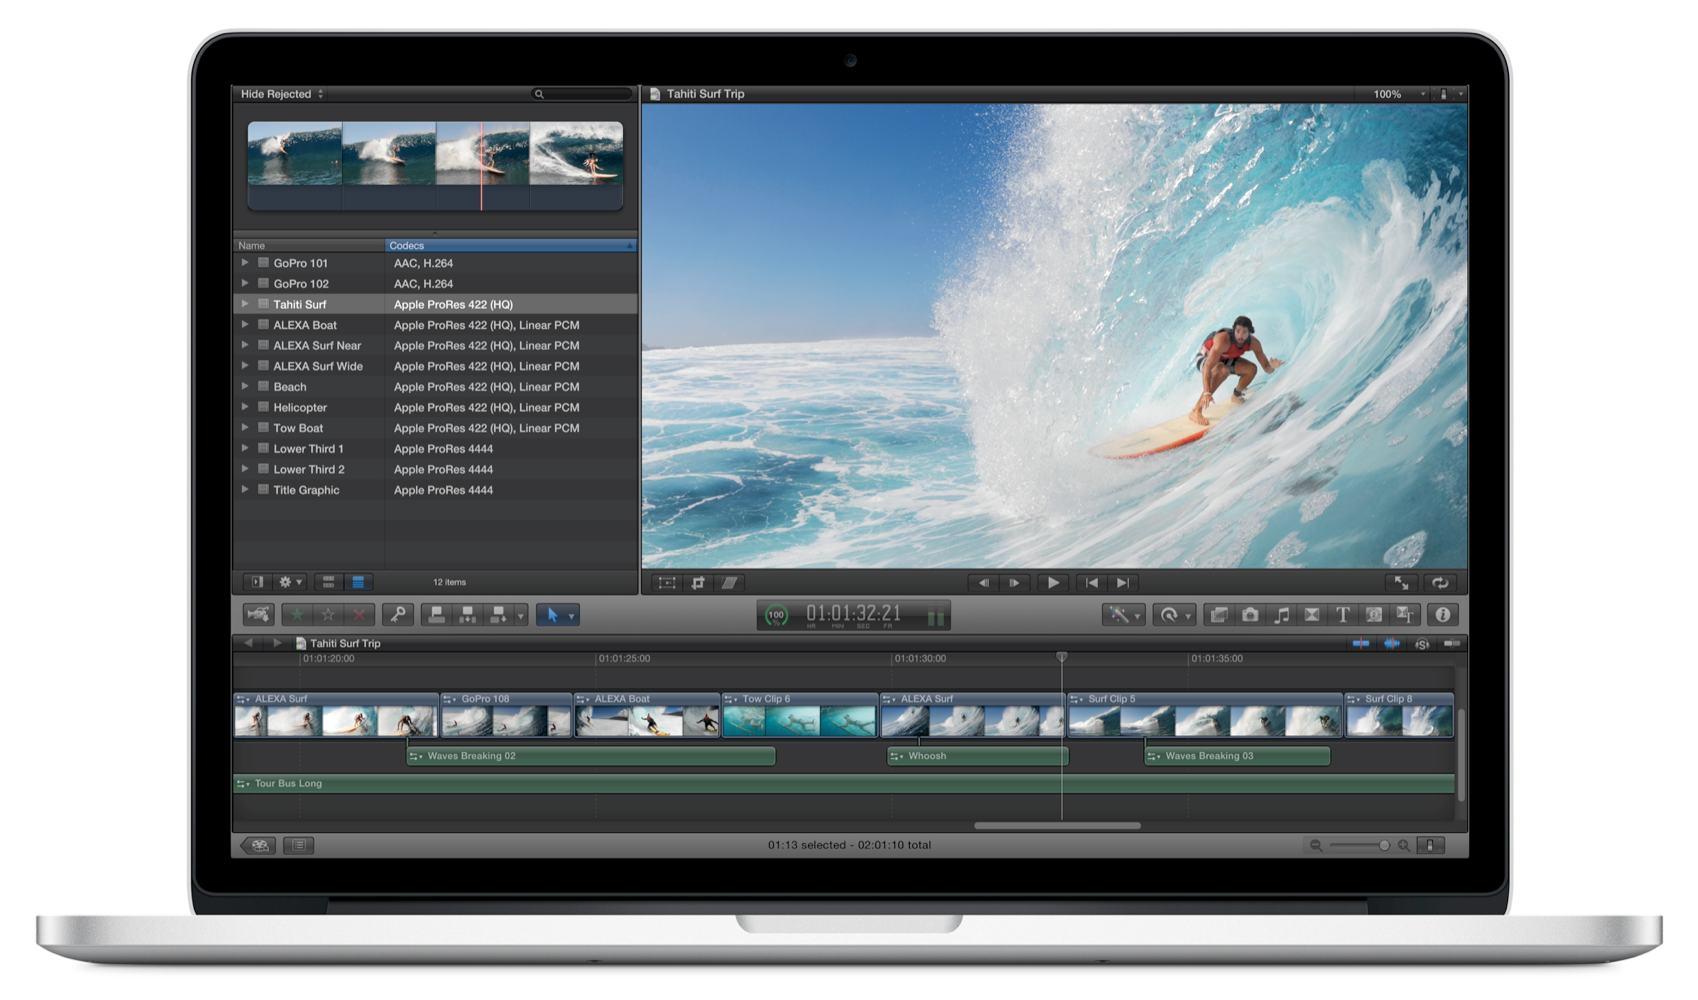 apple macbook pro me665ll a 15 4 inch laptop. Black Bedroom Furniture Sets. Home Design Ideas